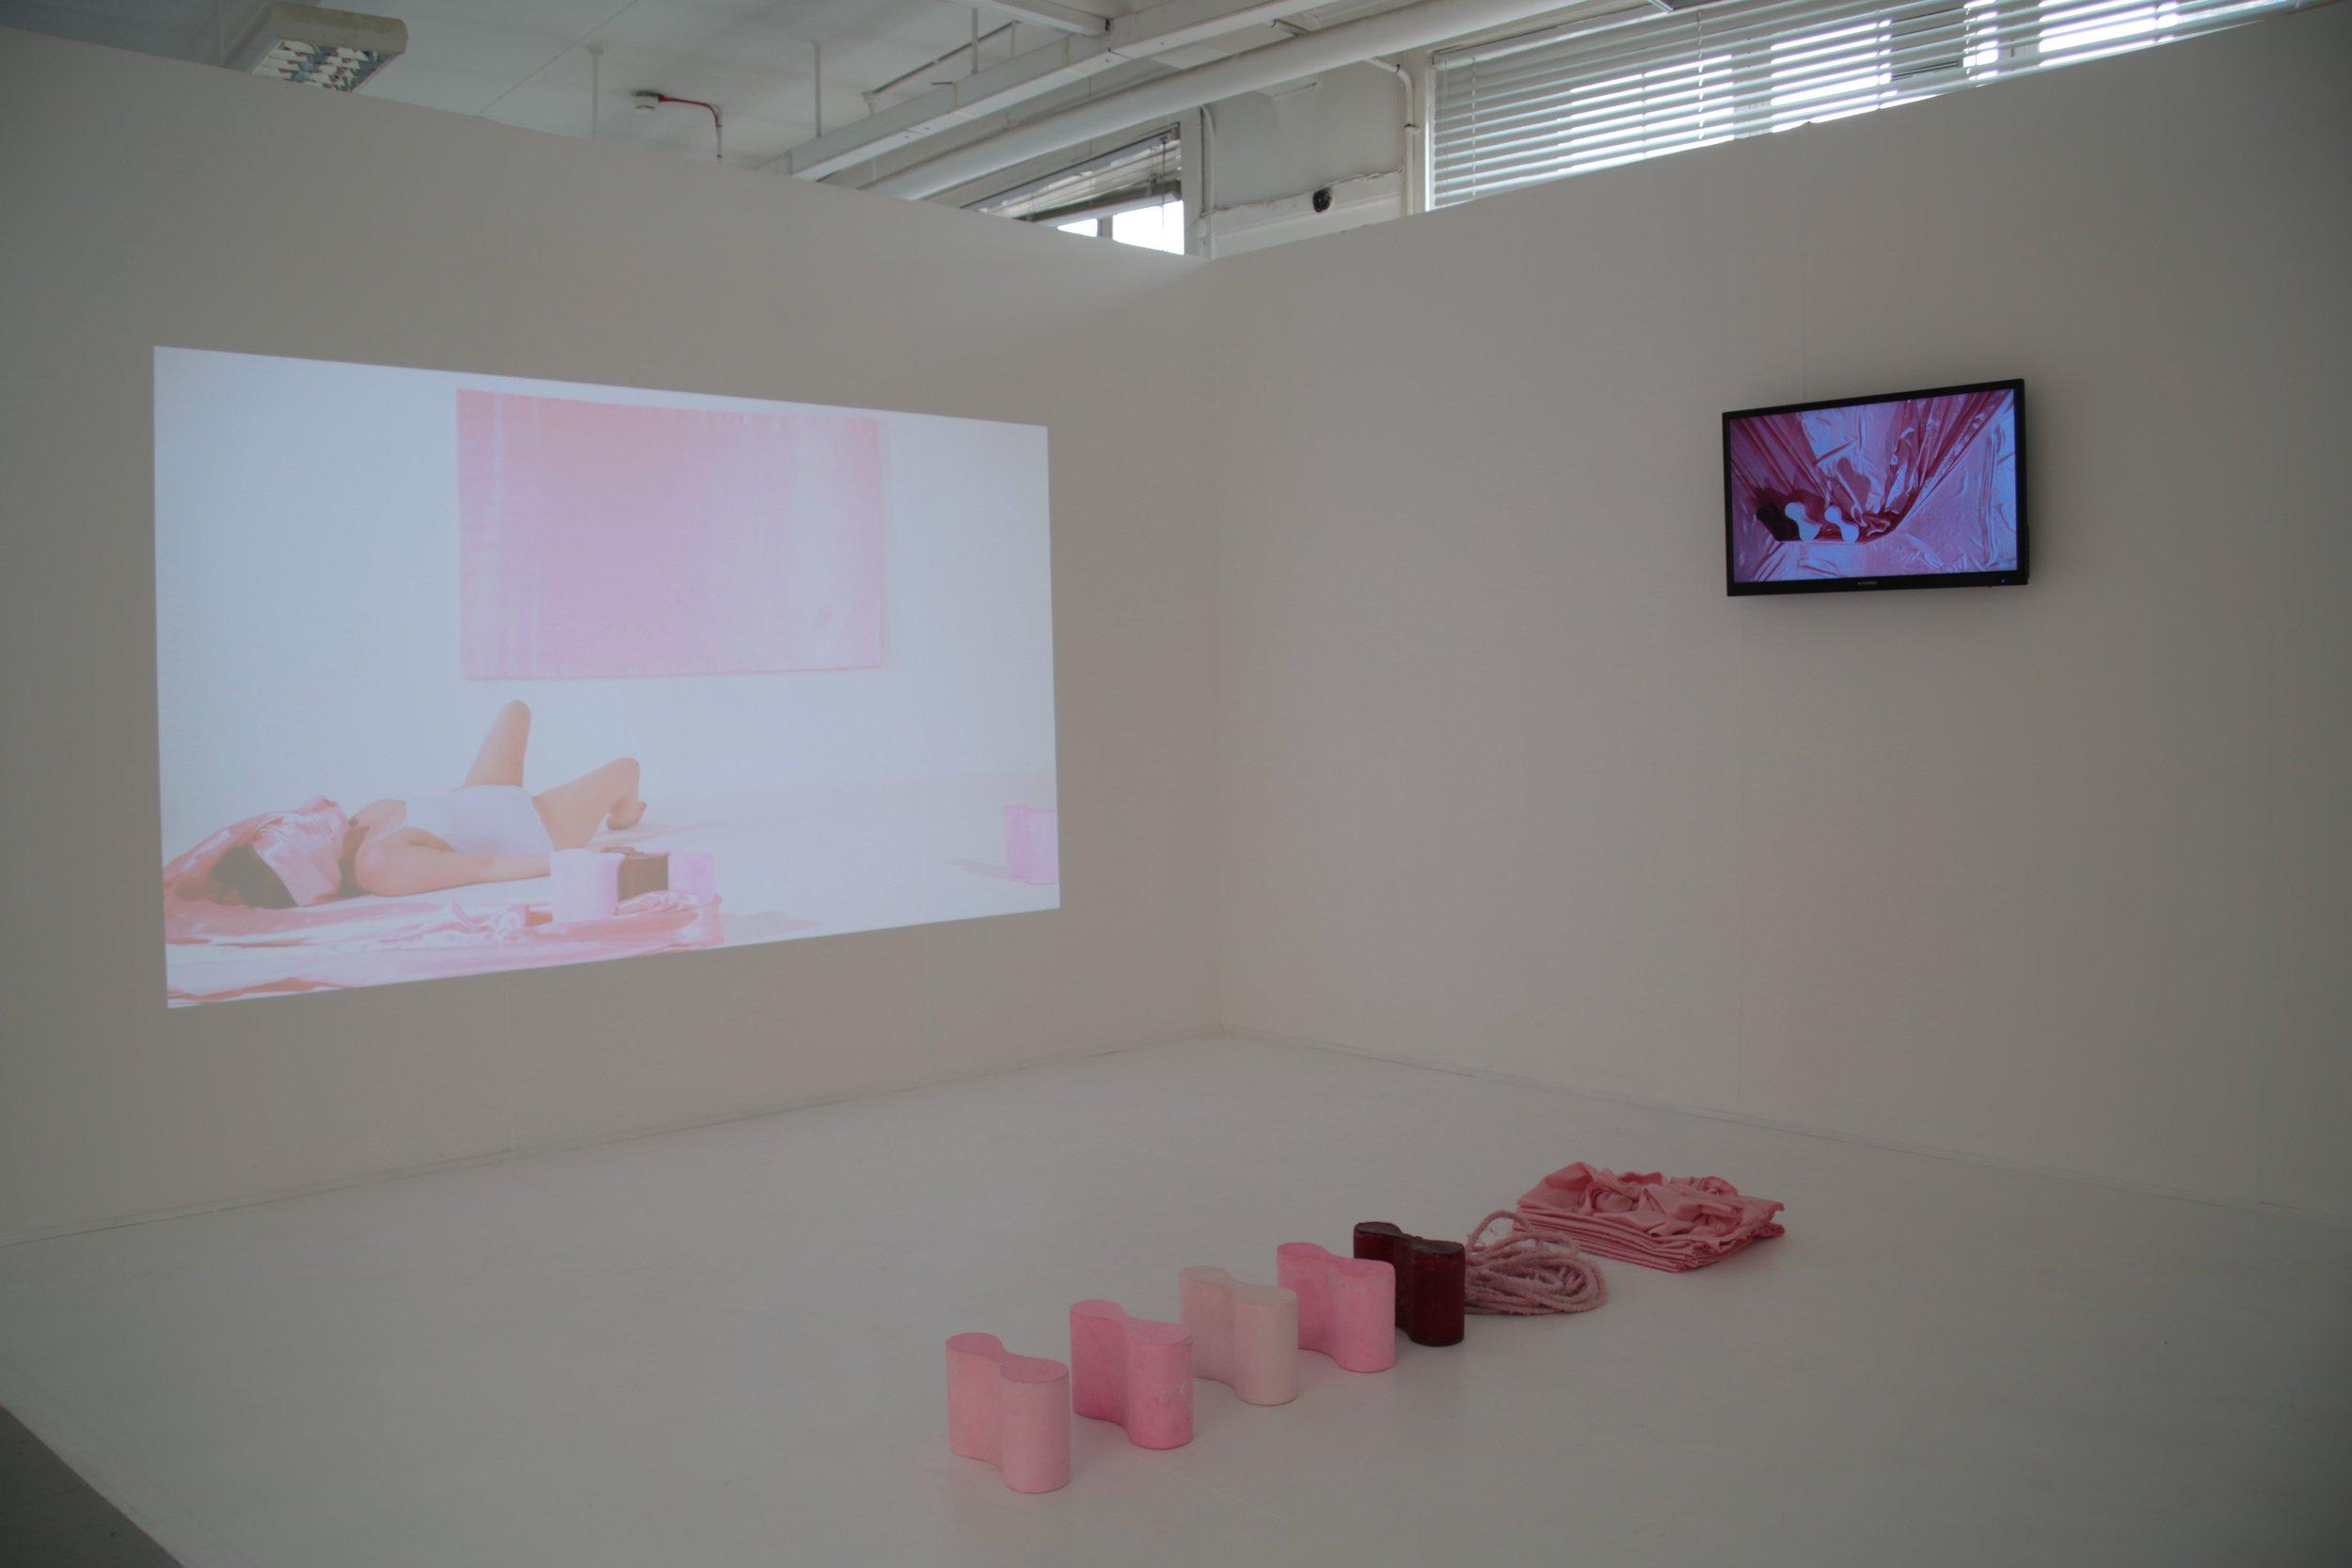 Restraint, Two Channel Video Installation  Glasgow School of art Degree Show June 2018